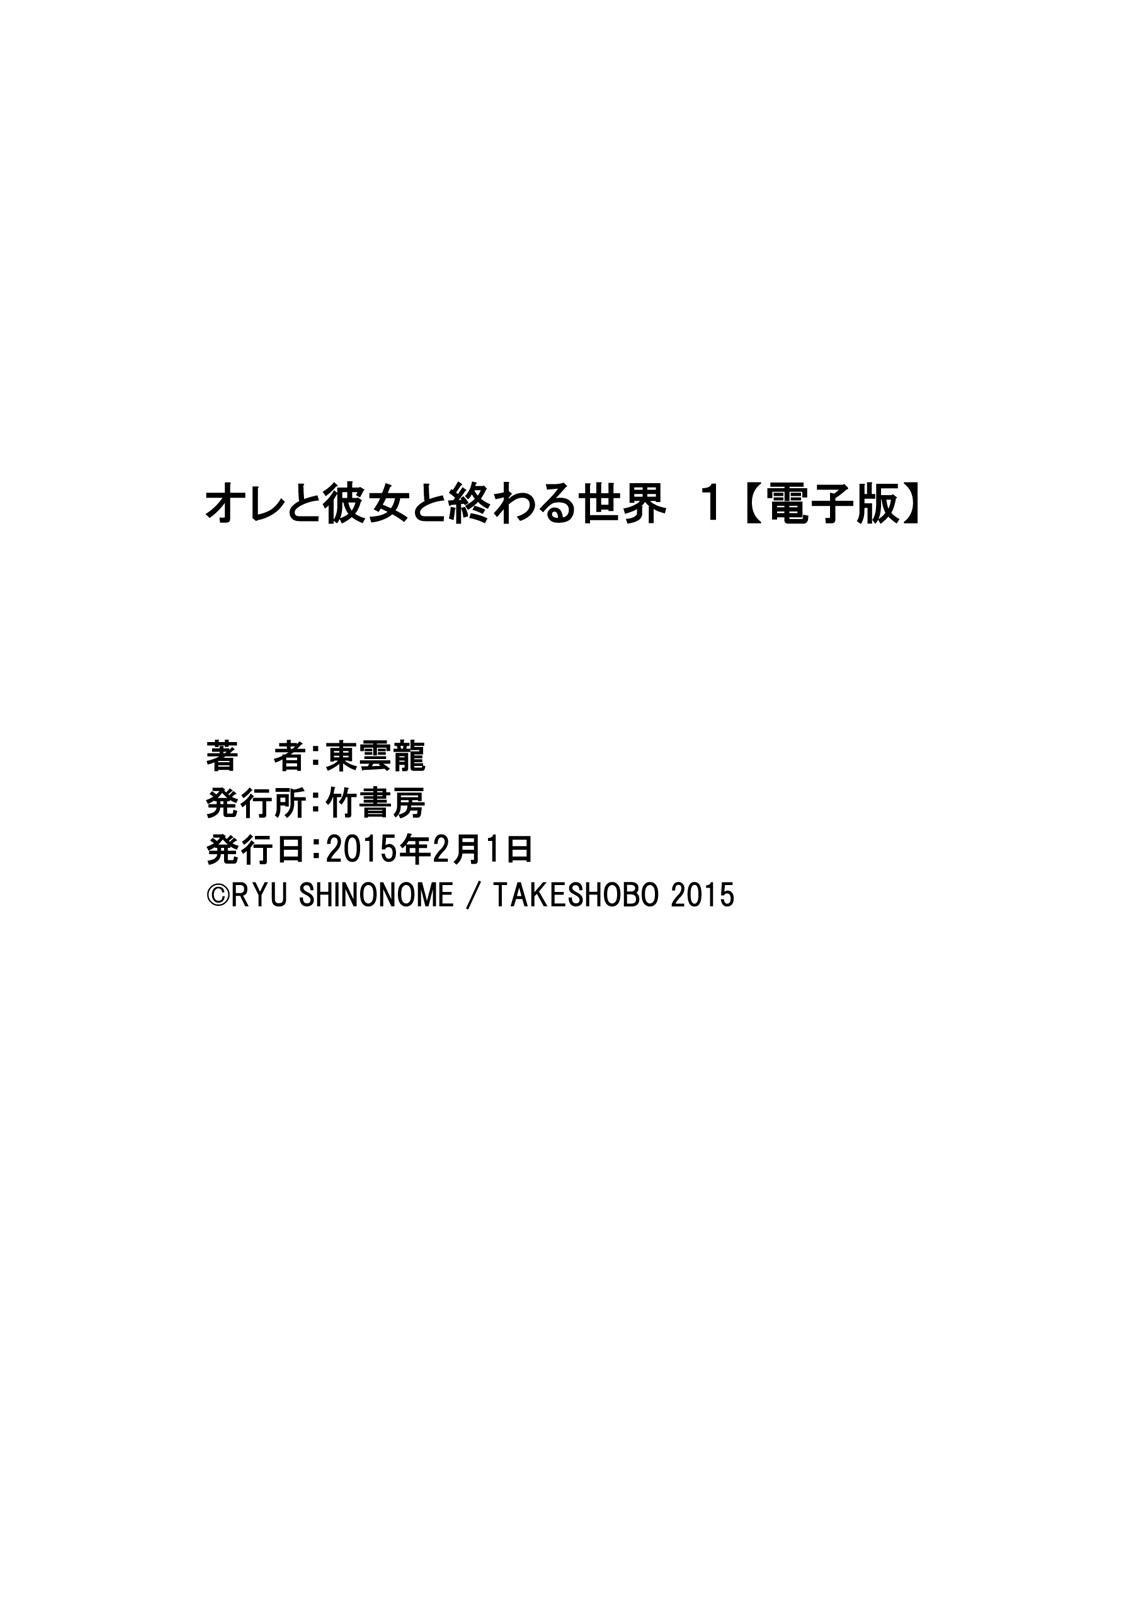 [Shinonome Ryu] Ore to Kanojo to Owaru Sekai - World's end LoveStory ch.1-9 [Chinese] [爱弹幕汉化组] [Digital] 195